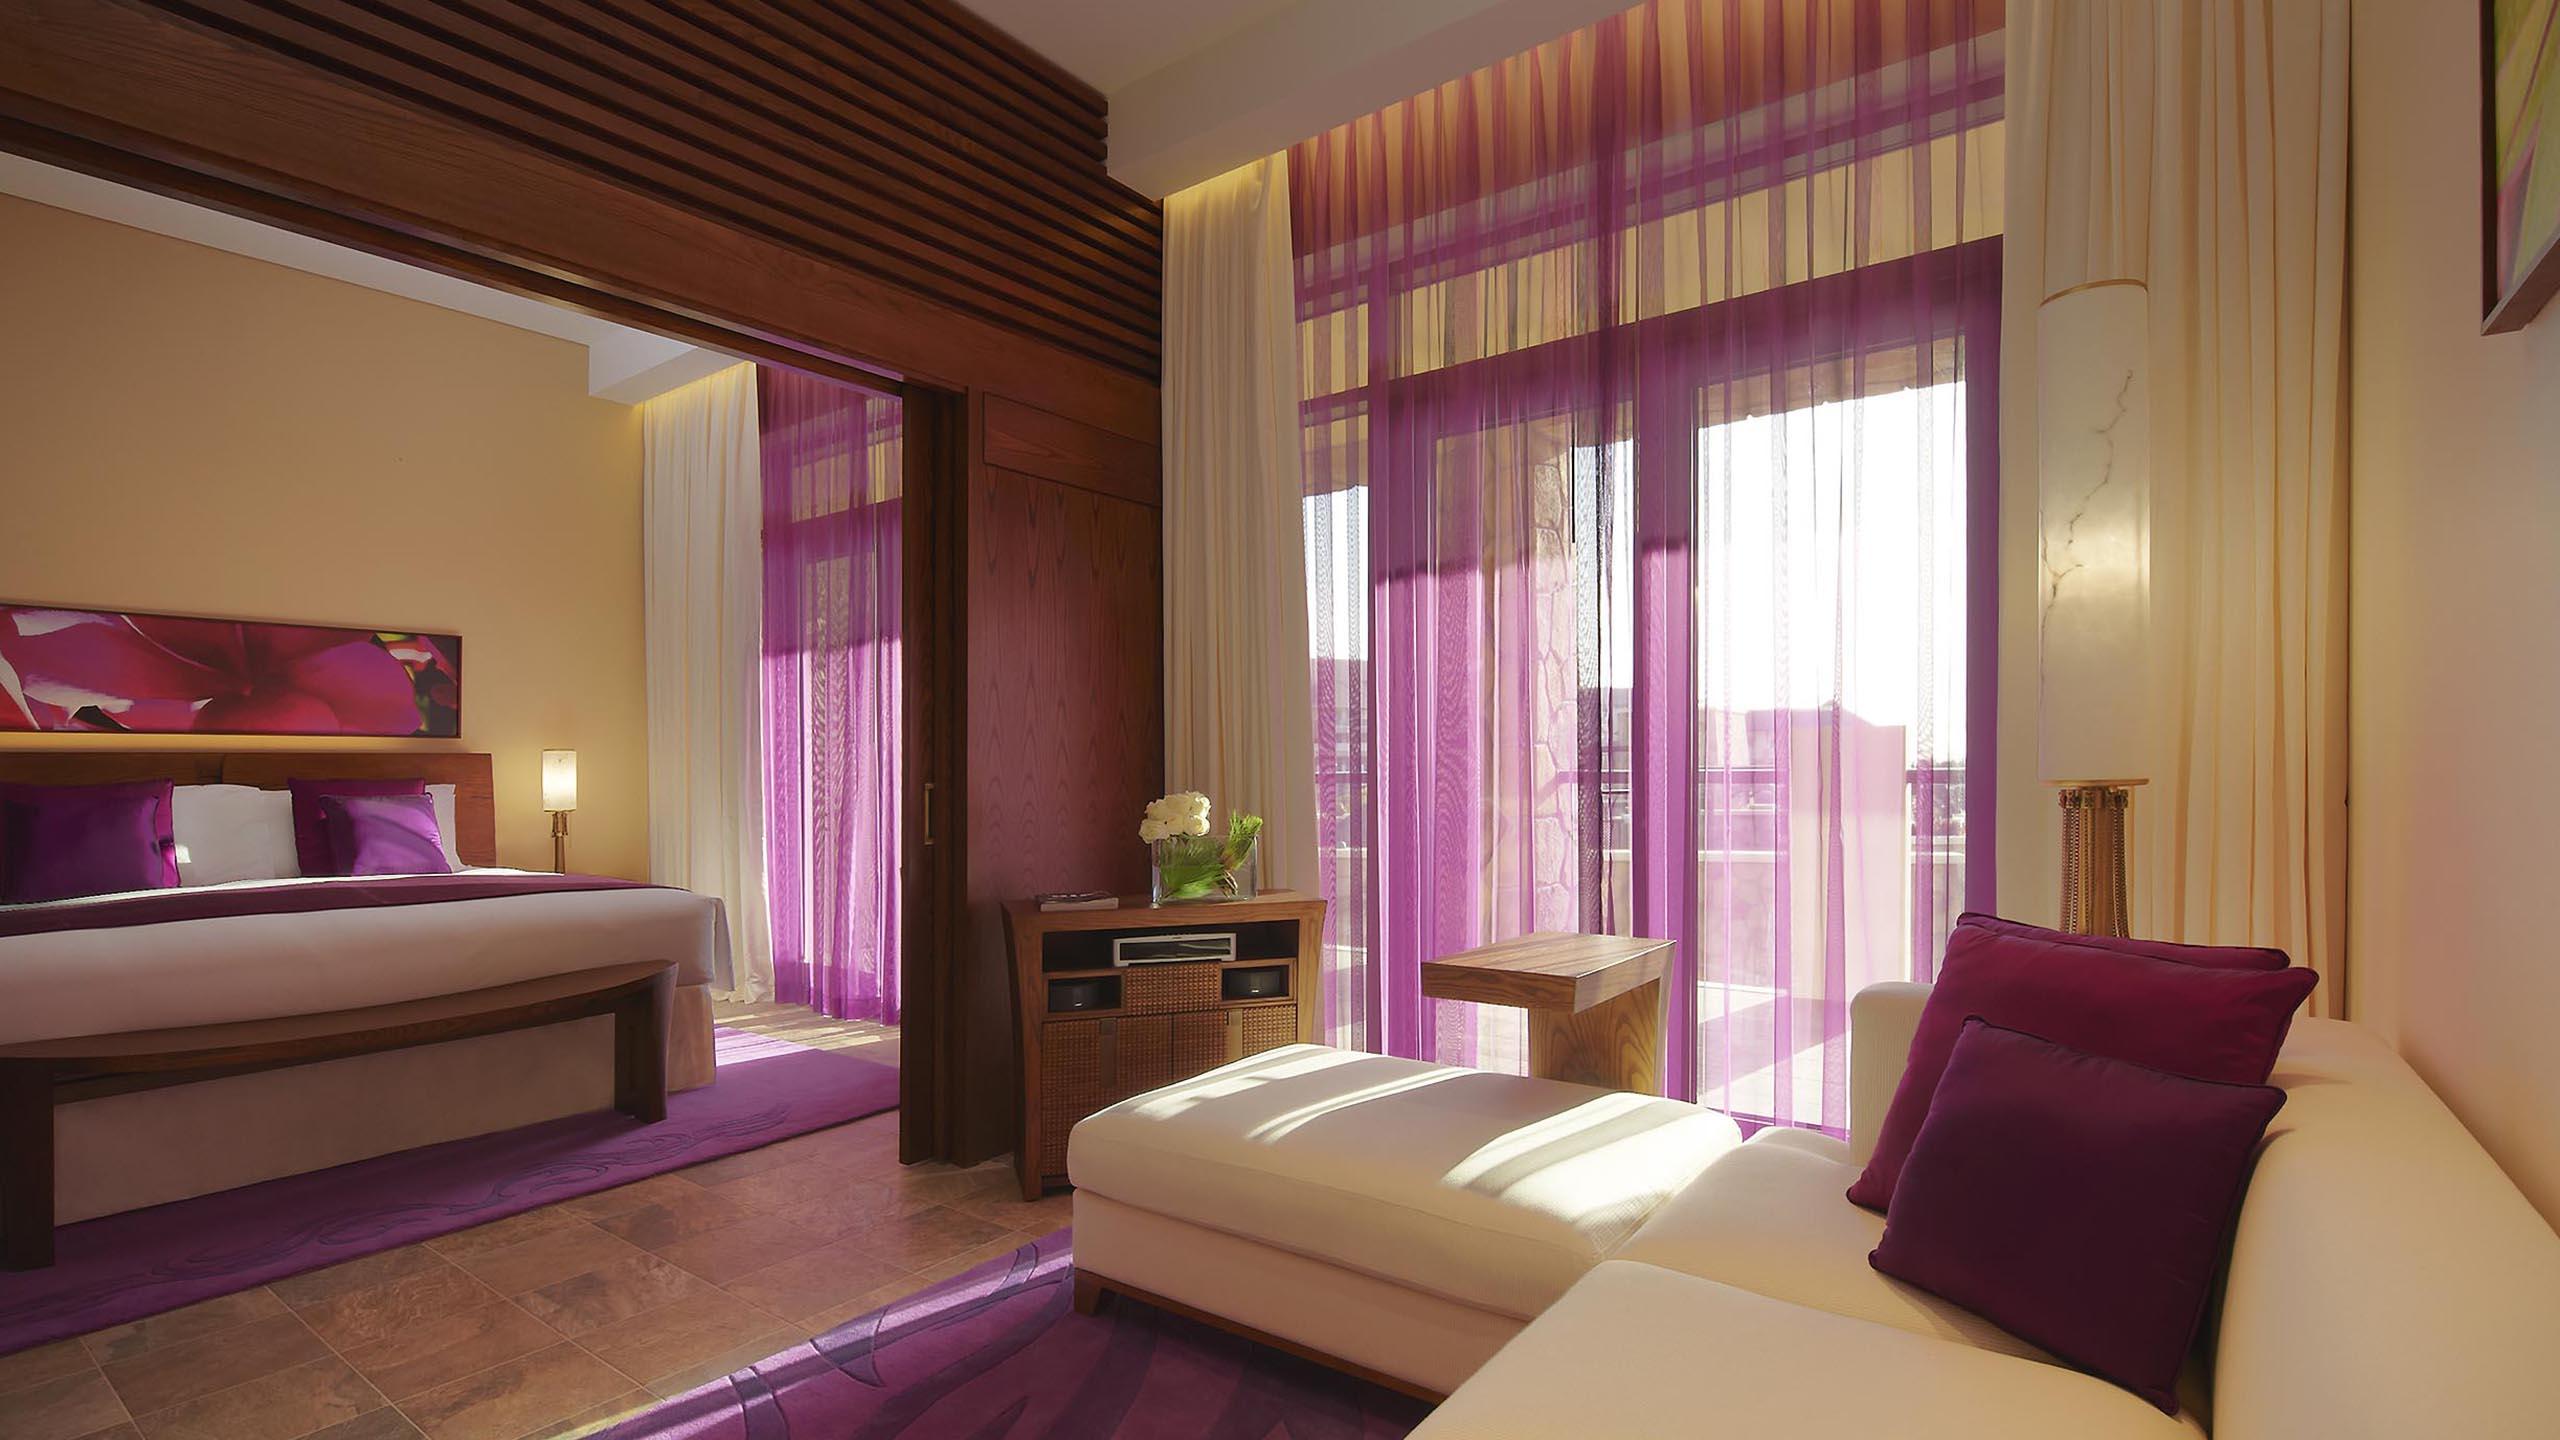 luxury hotel dubai – sofitel dubai the palm resort & spa, Badezimmer ideen